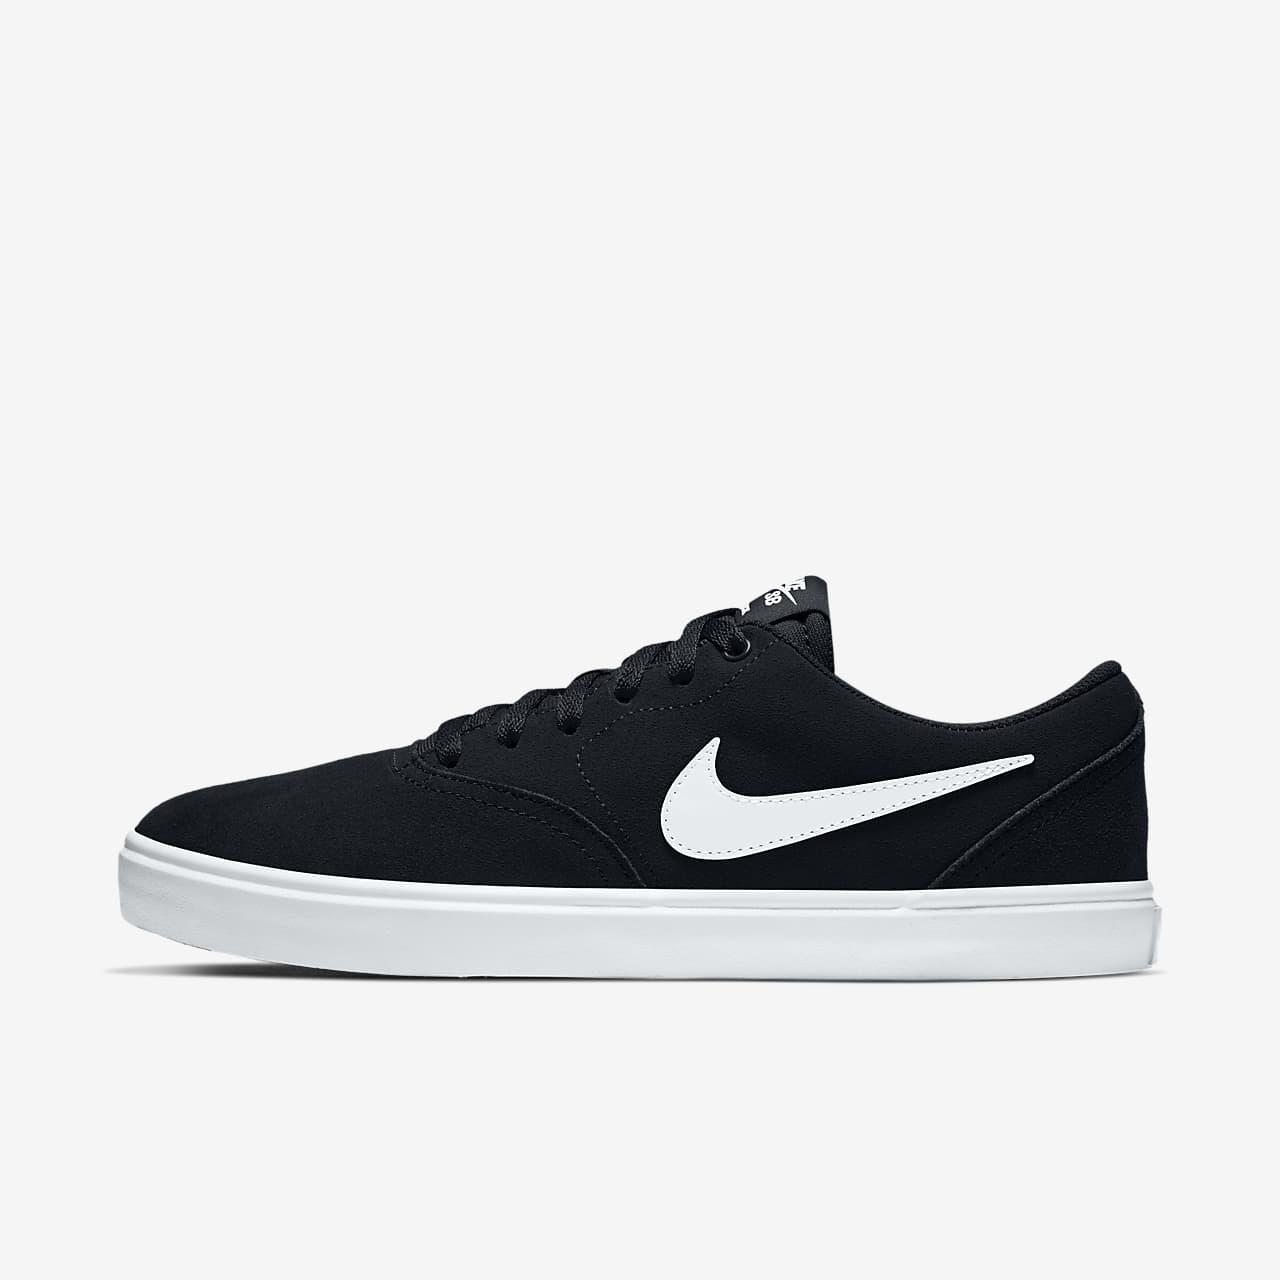 ... Chaussure de skateboard Nike SB Check Solarsoft pour Homme